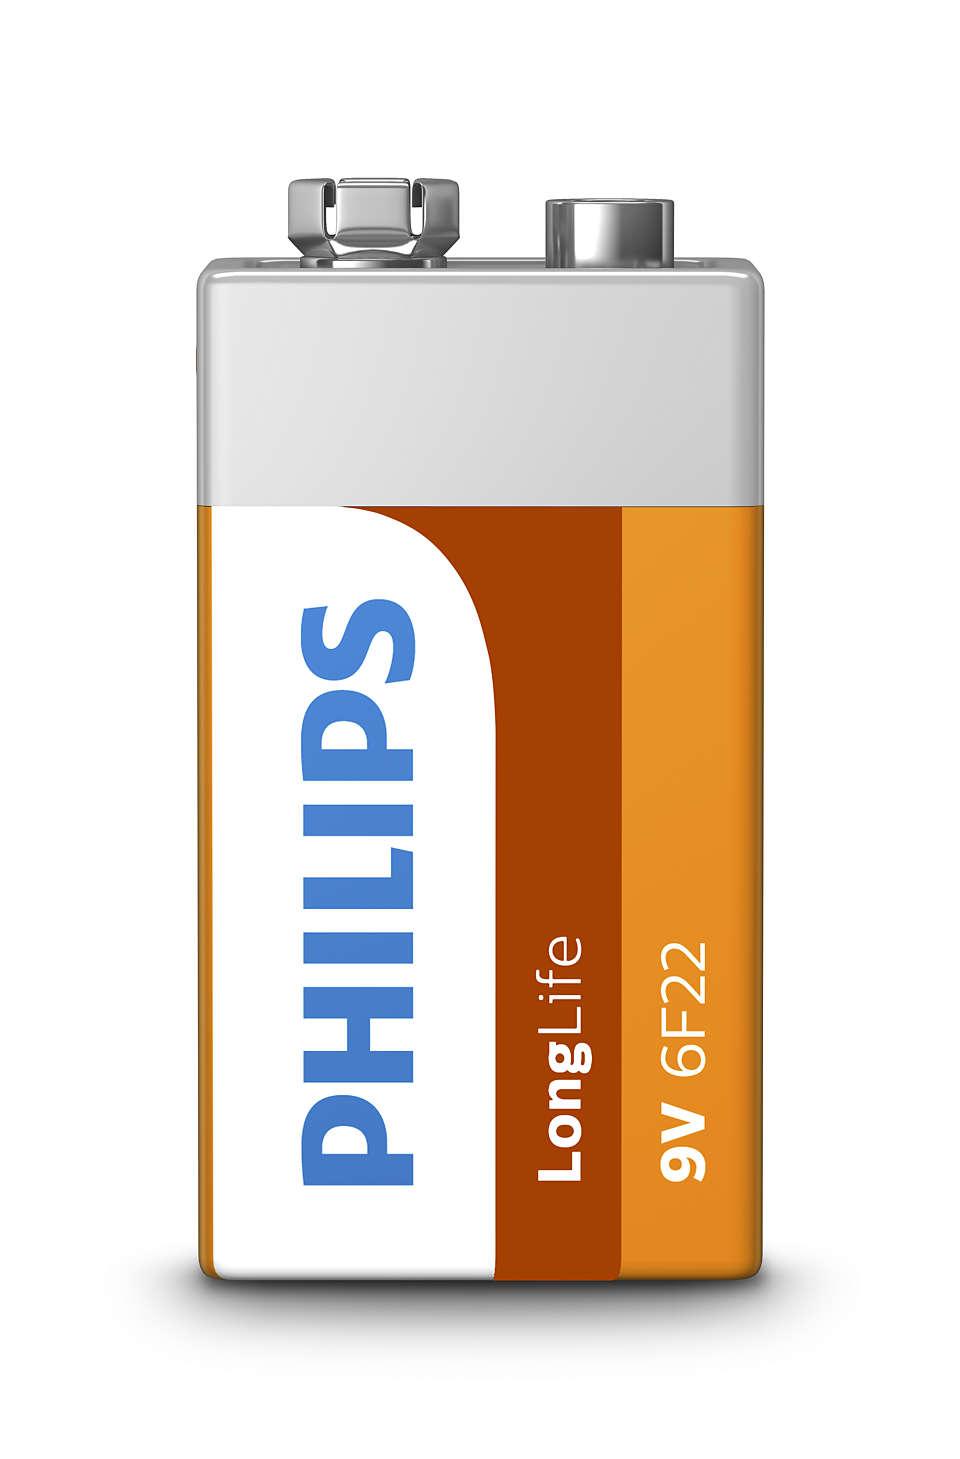 Top low-drain device batteries